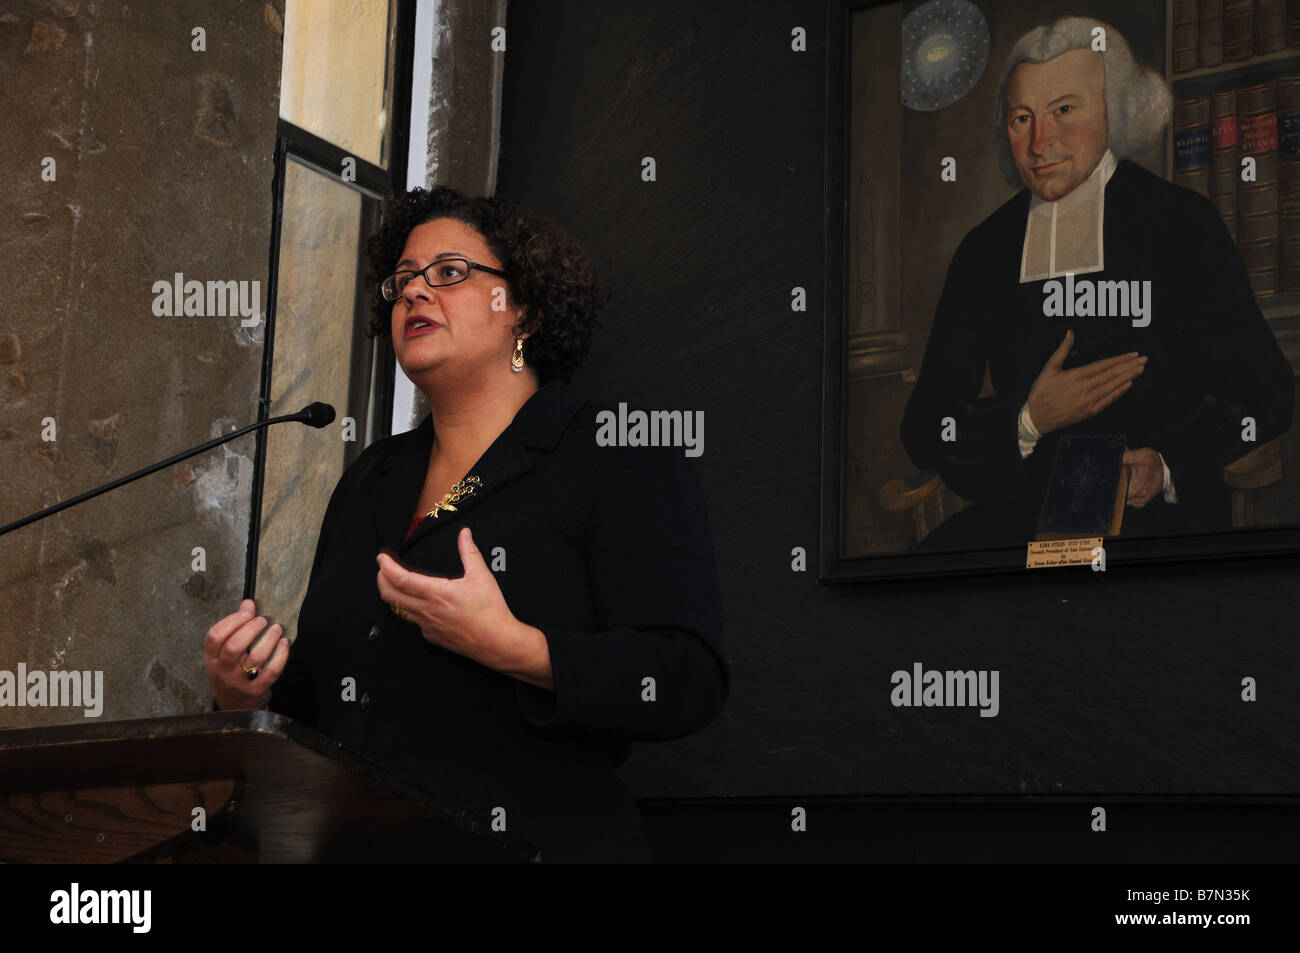 Poet Elizabeth Alexander, who read a poem at President Barack Obama's inauguration, addressing a gathering at - Stock Image